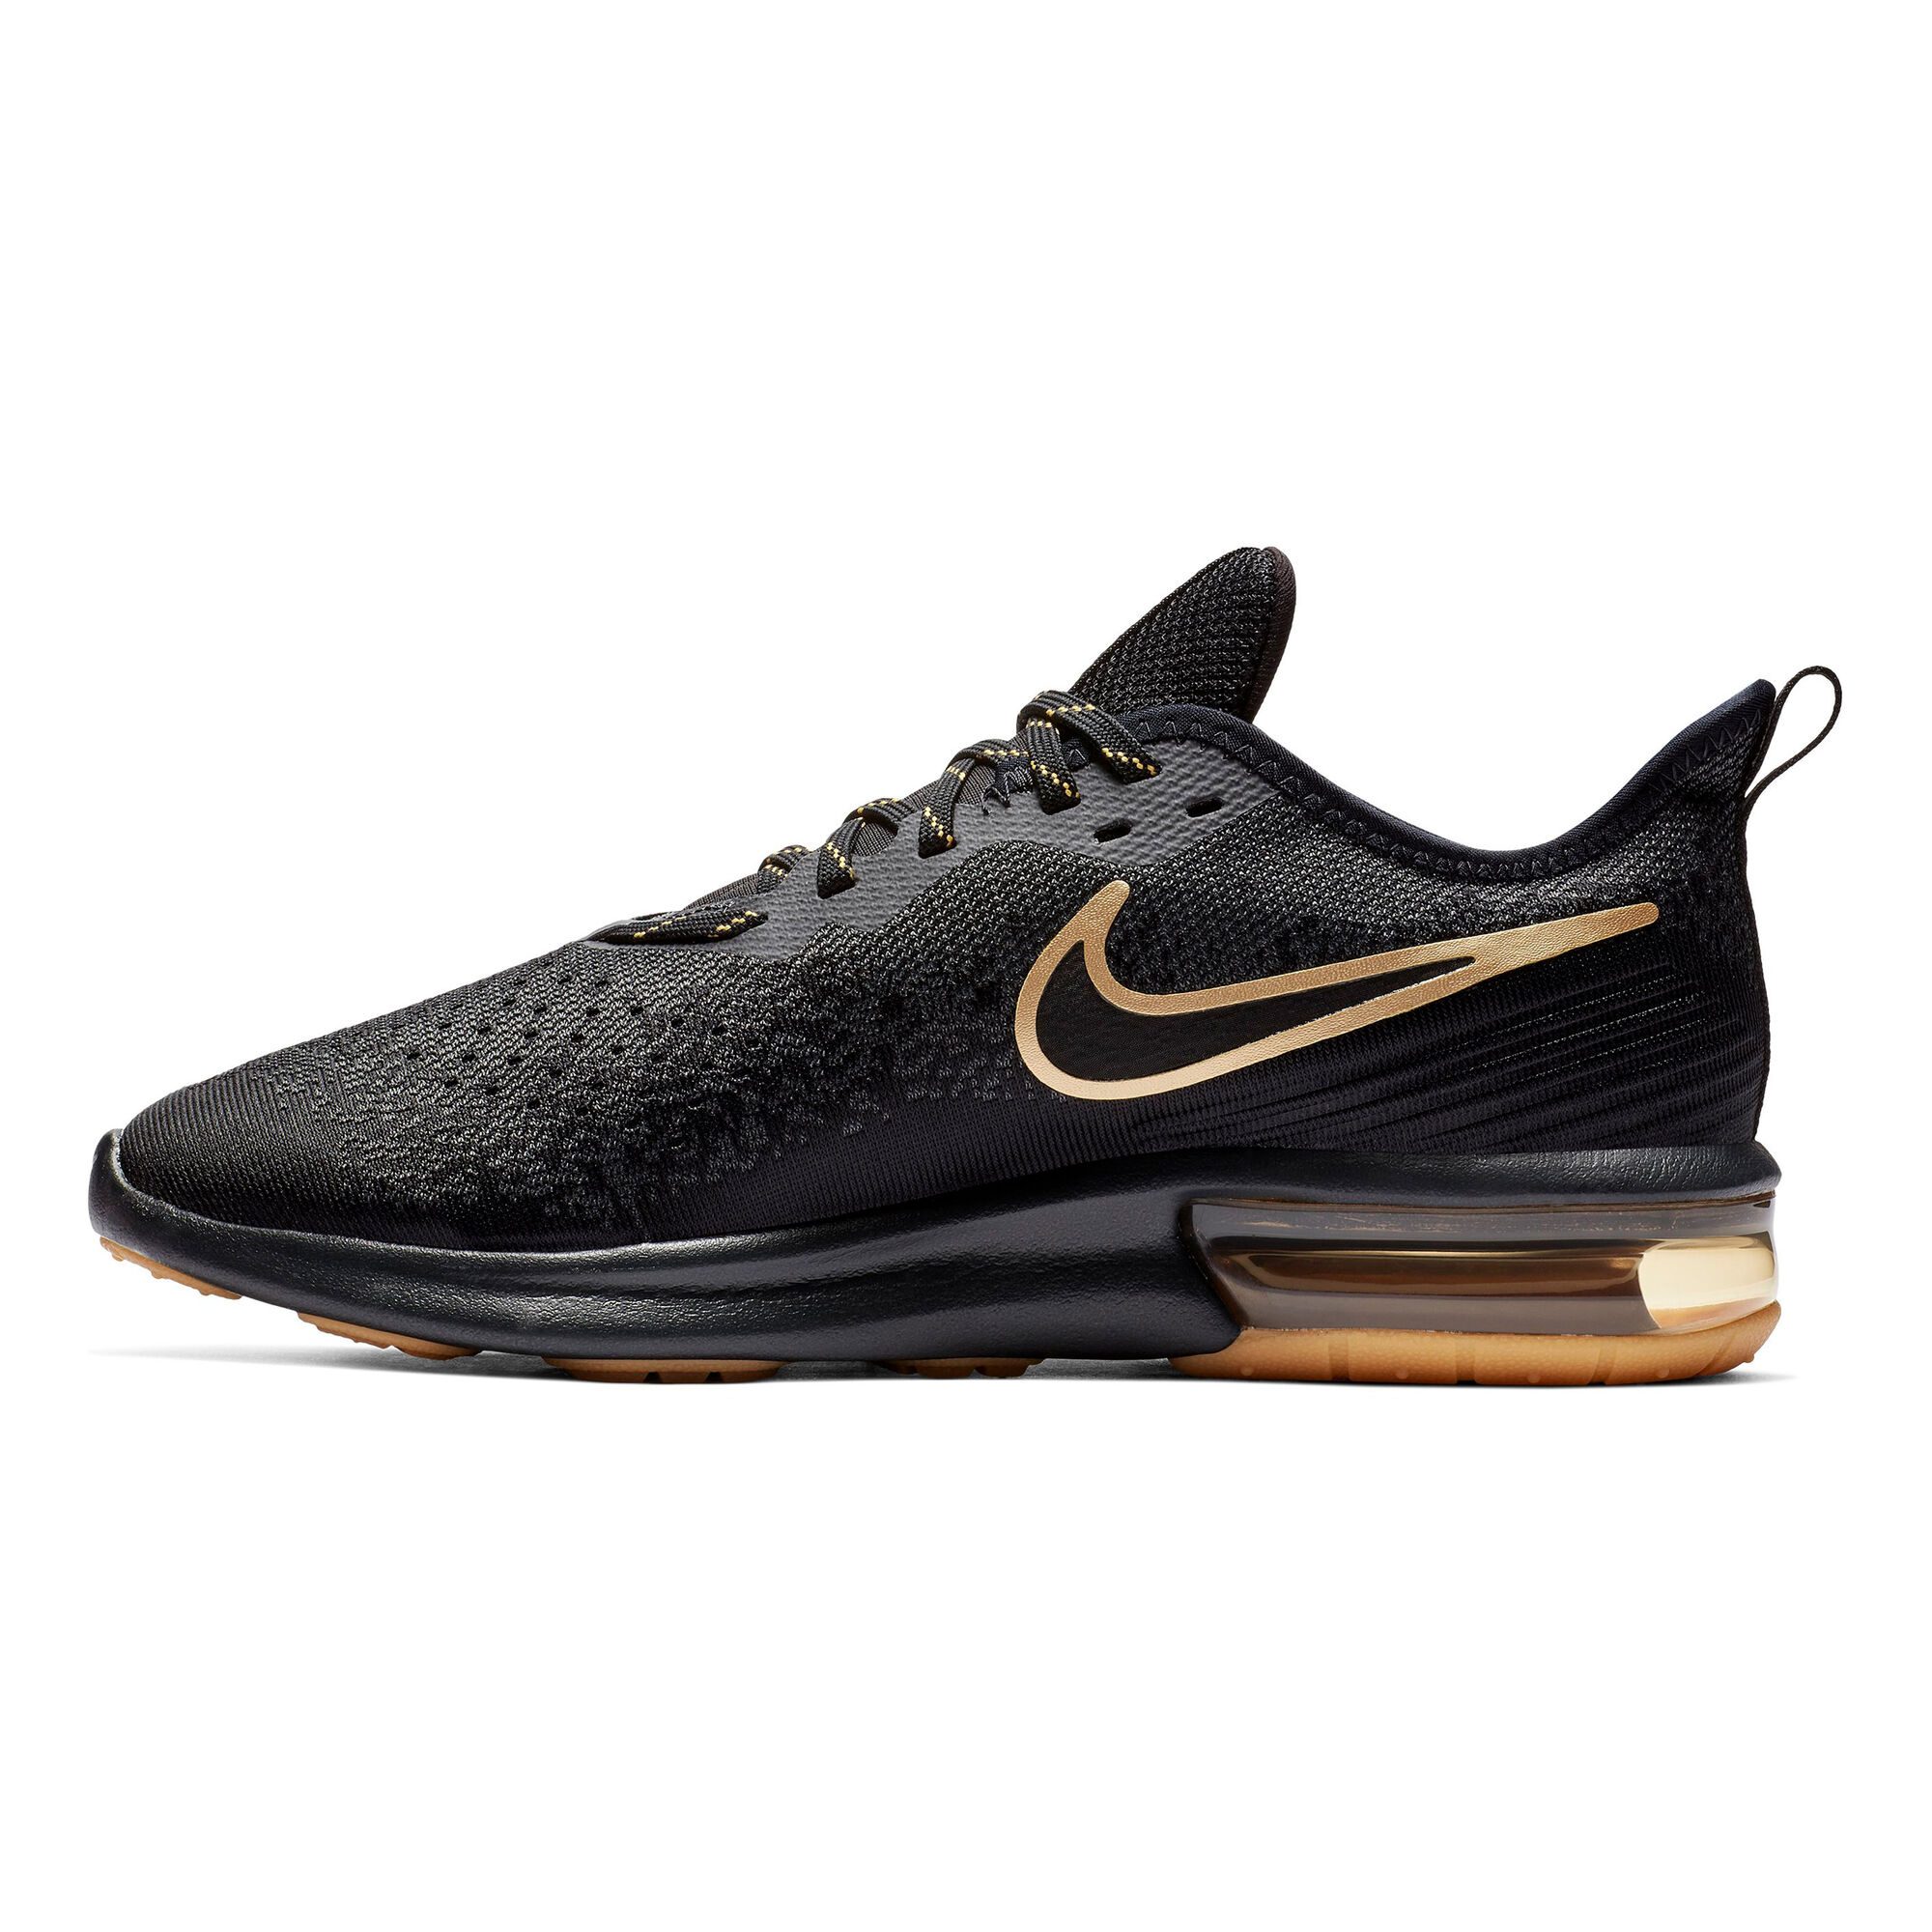 3cdc5d0d573 Nike  Nike  Nike  Nike  Nike  Nike  Nike  Nike  Nike  Nike. Air Max Sequent  4 ...